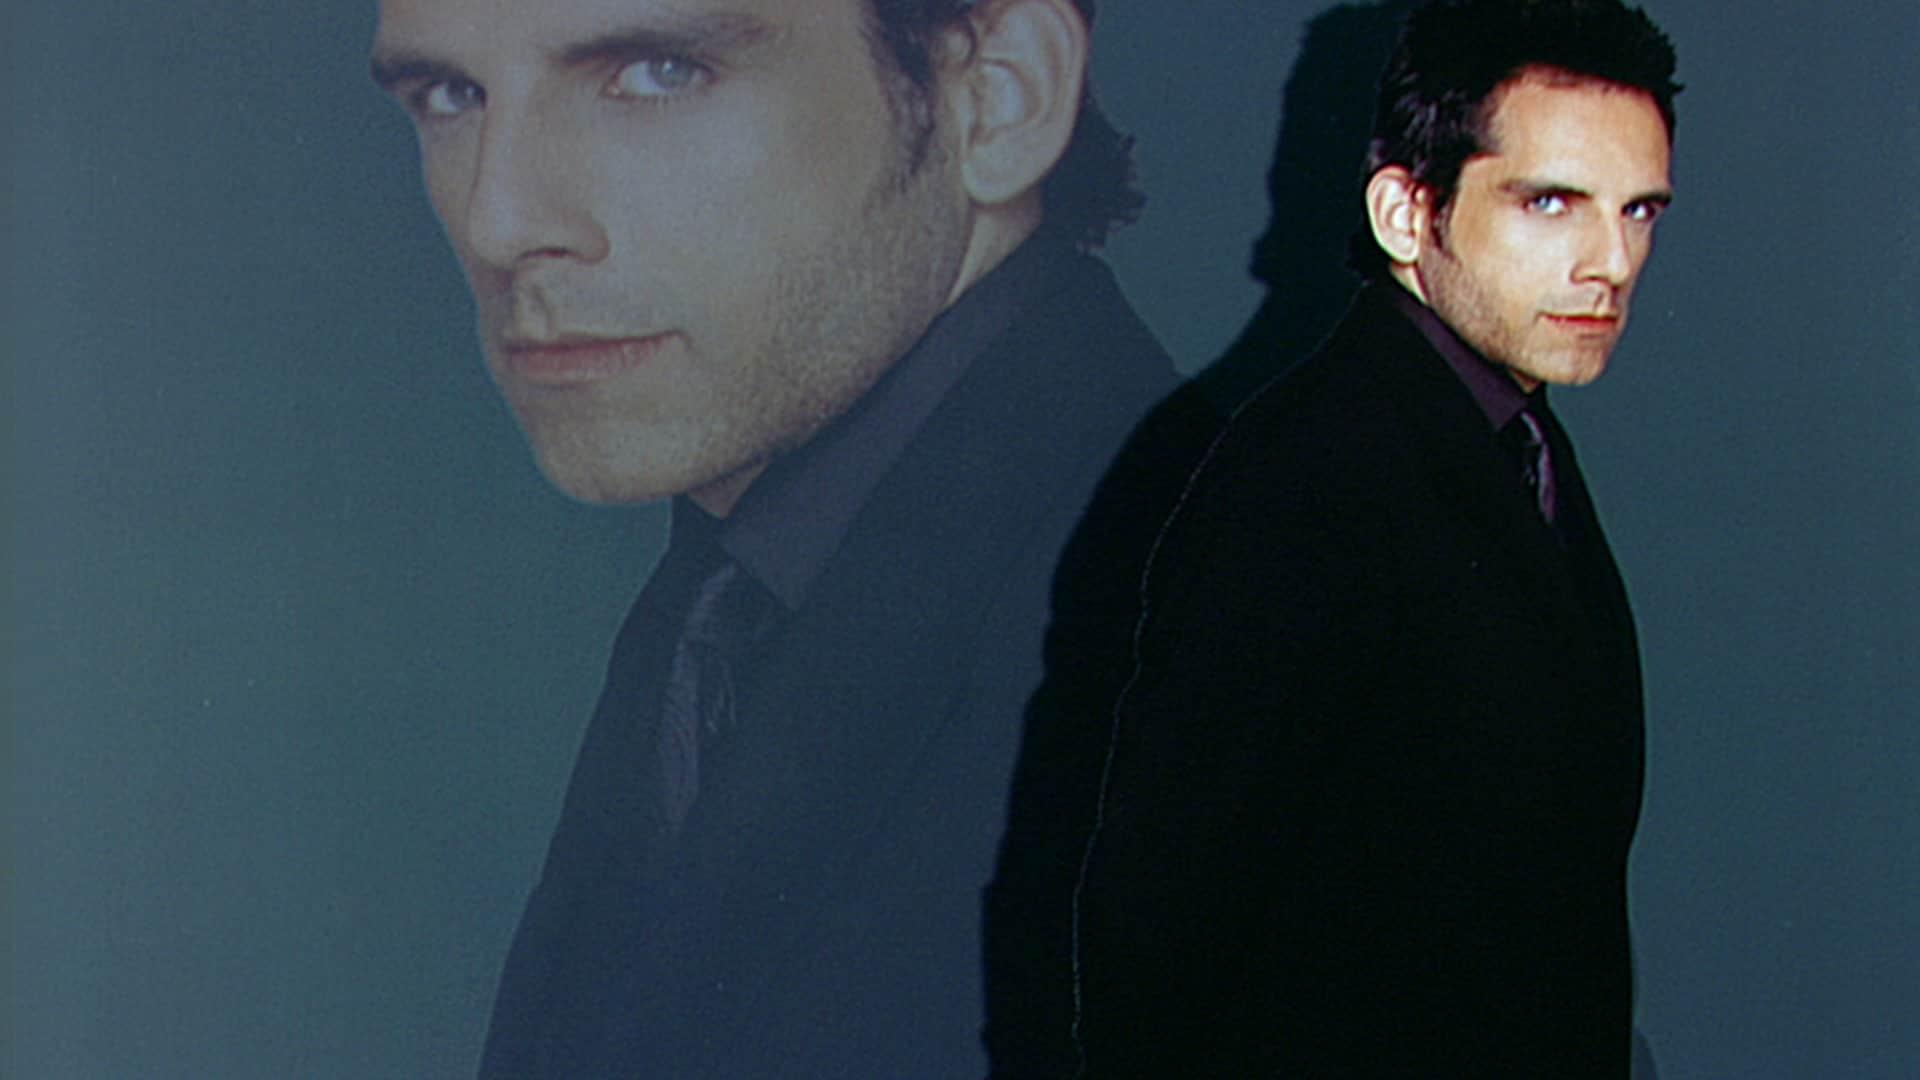 Ben Stiller: October 24, 1998